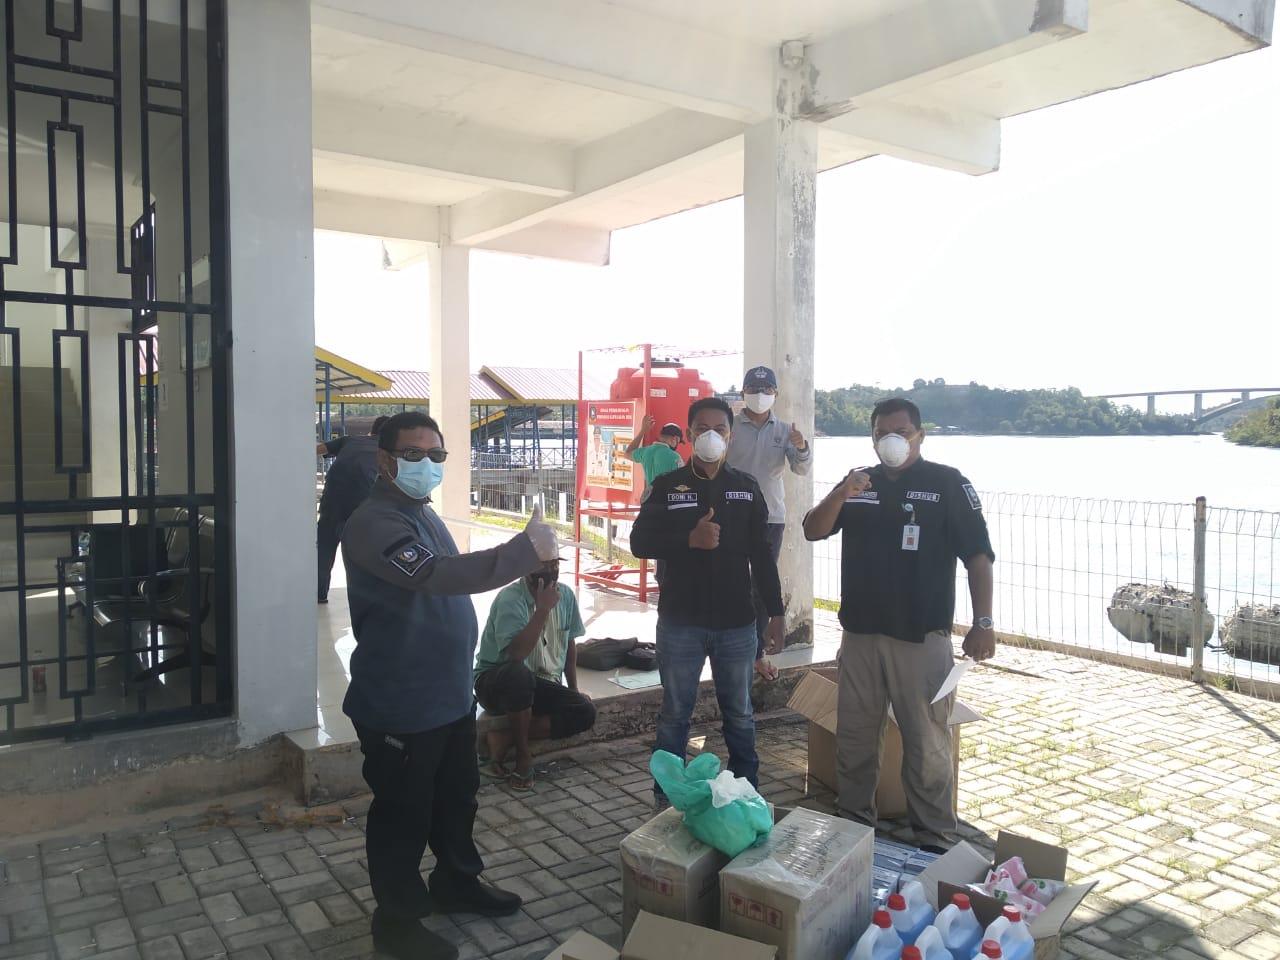 Foto Penyerahan Bantuan Disinfektan dan Sabun Cuci Tangan dari Dinas Perhubungan Prov.Kepri untuk Pelabuhan VIP Punggur dan Pelabuhan Sijantung